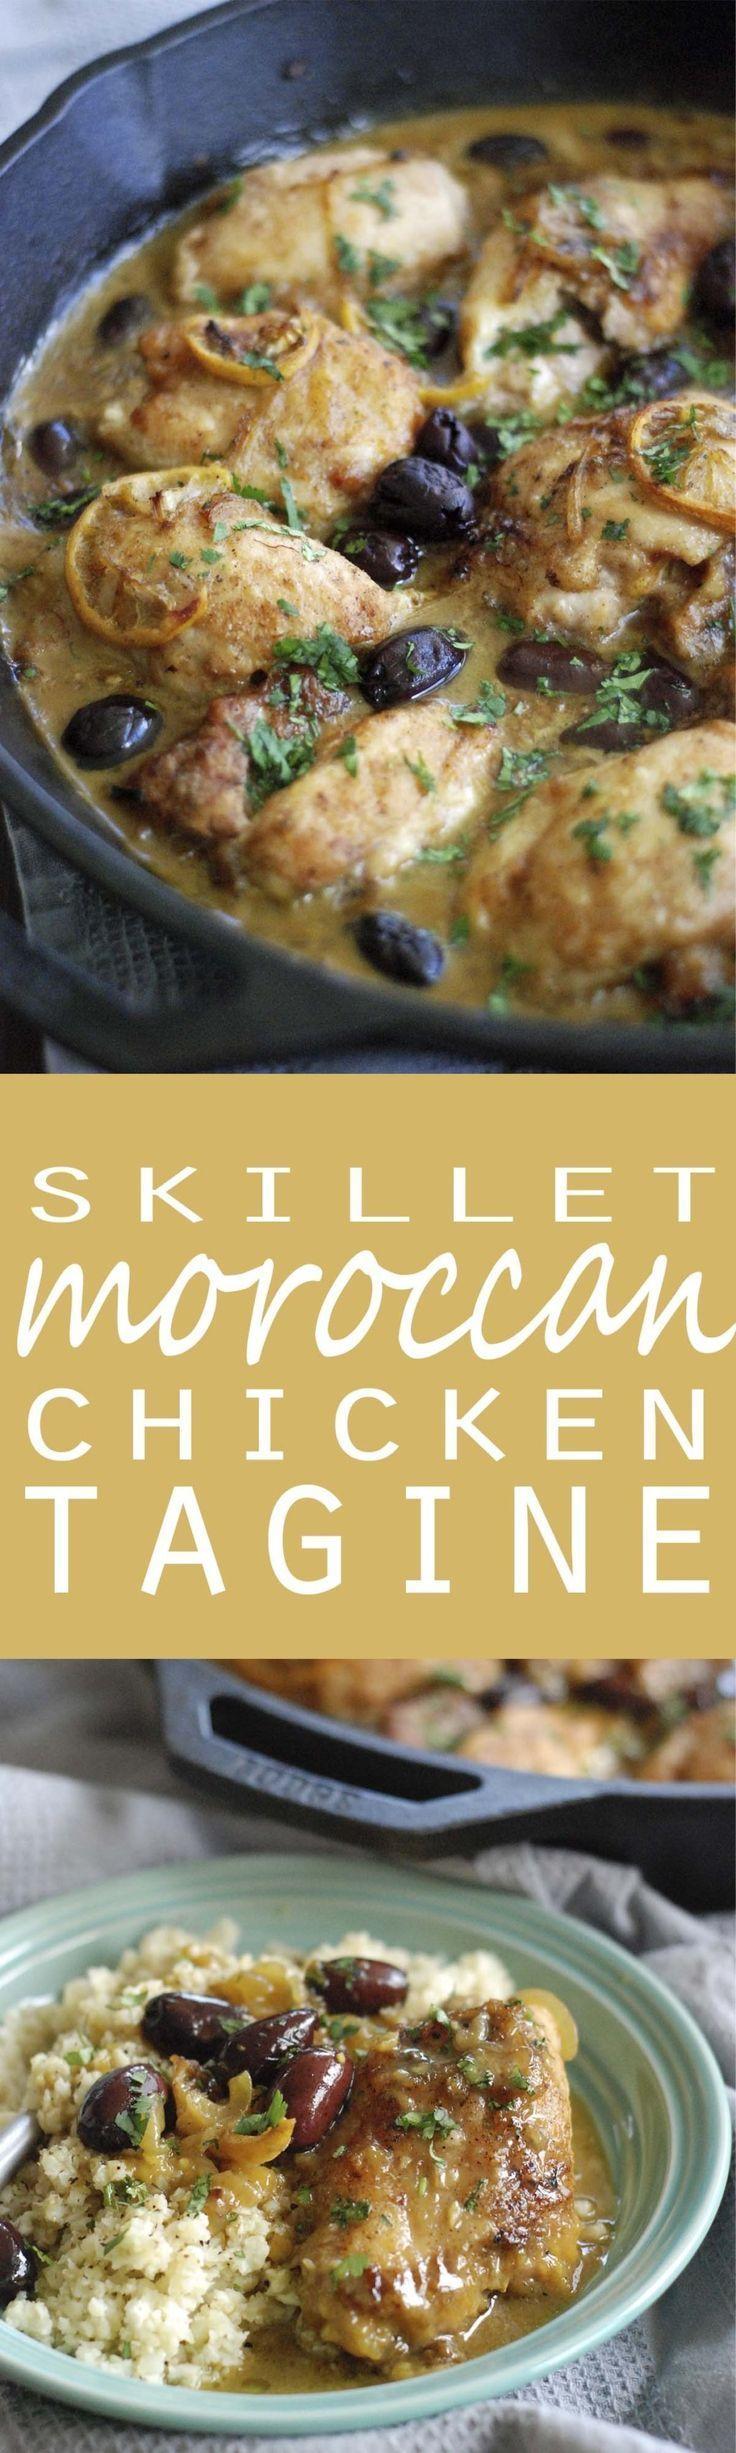 Paleo Skillet Moroccan Chicken Tajine Recipe